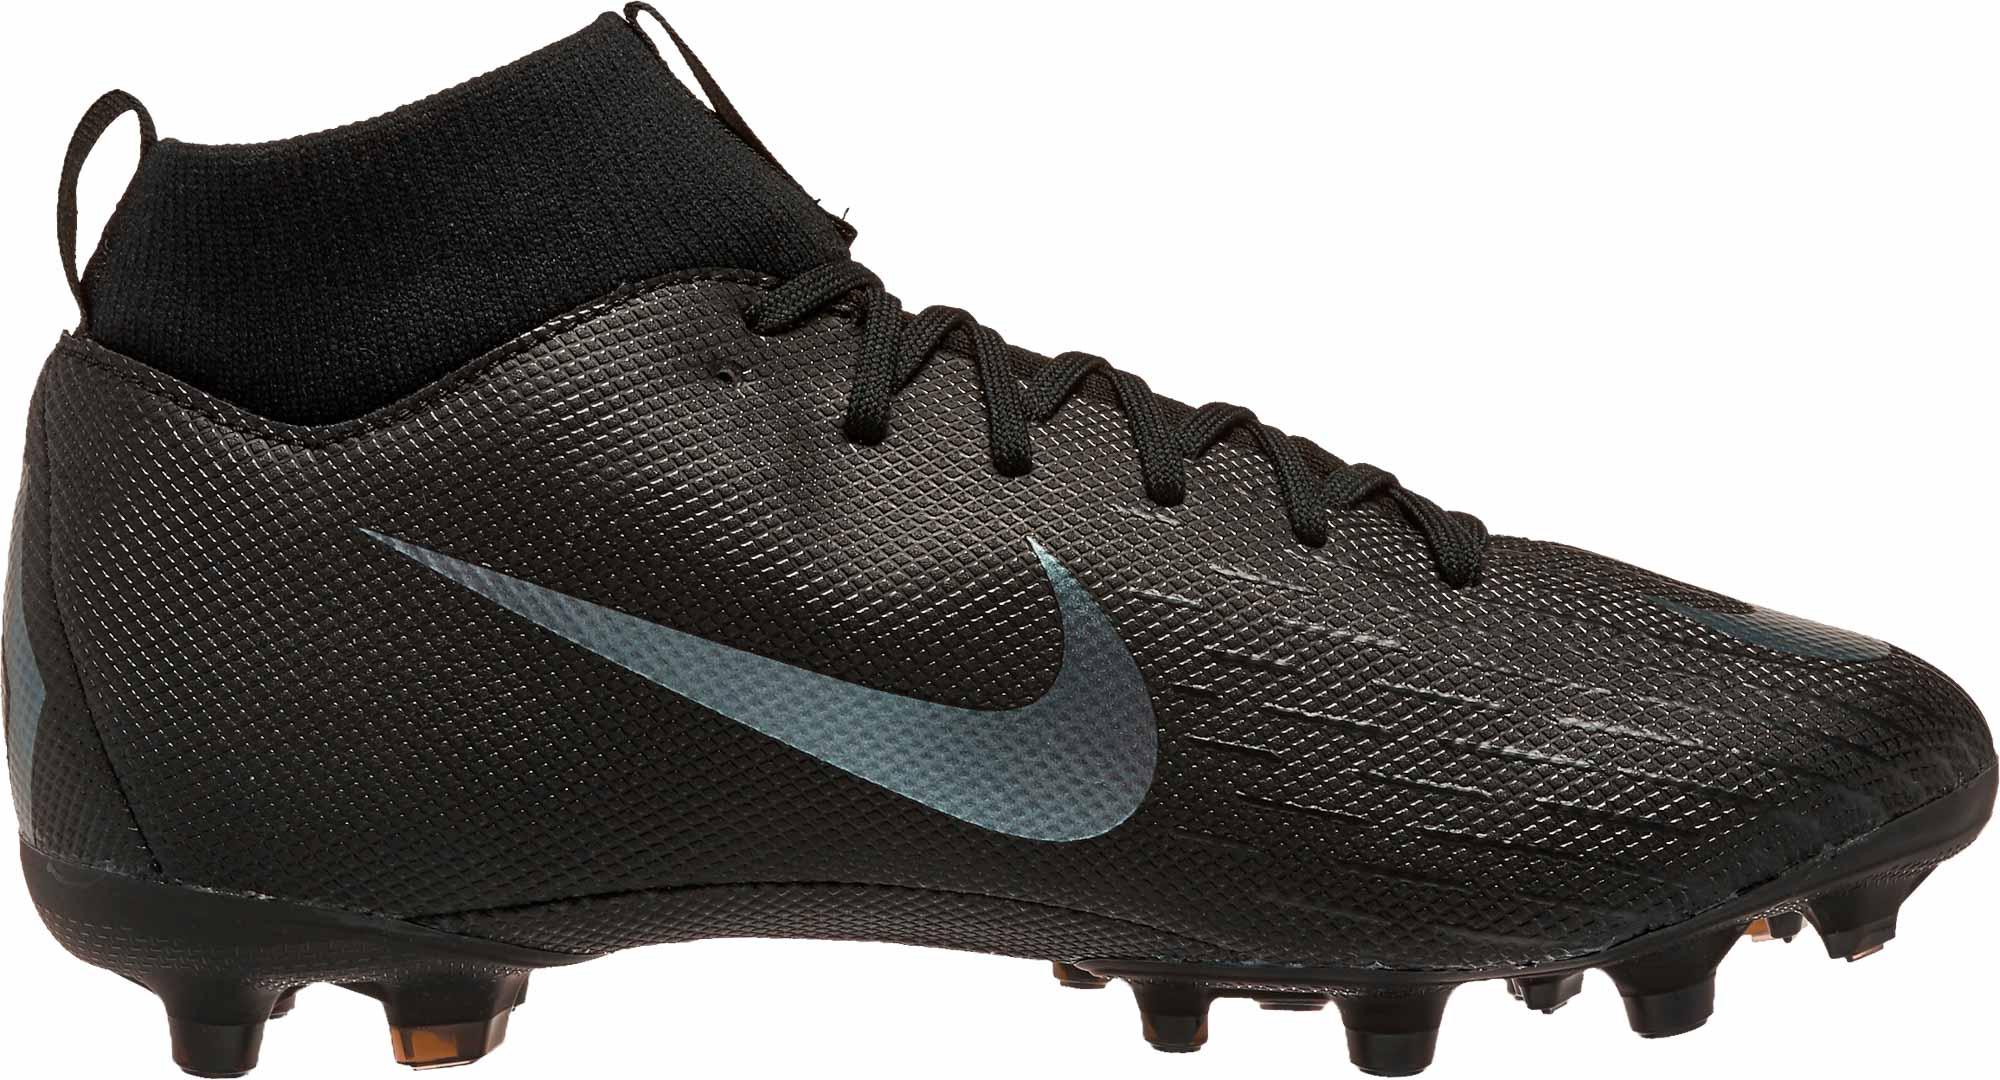 uk availability 4dc20 53cdb Nike Mercurial Superfly 6 Academy MG - Youth - Black/Black - SoccerPro